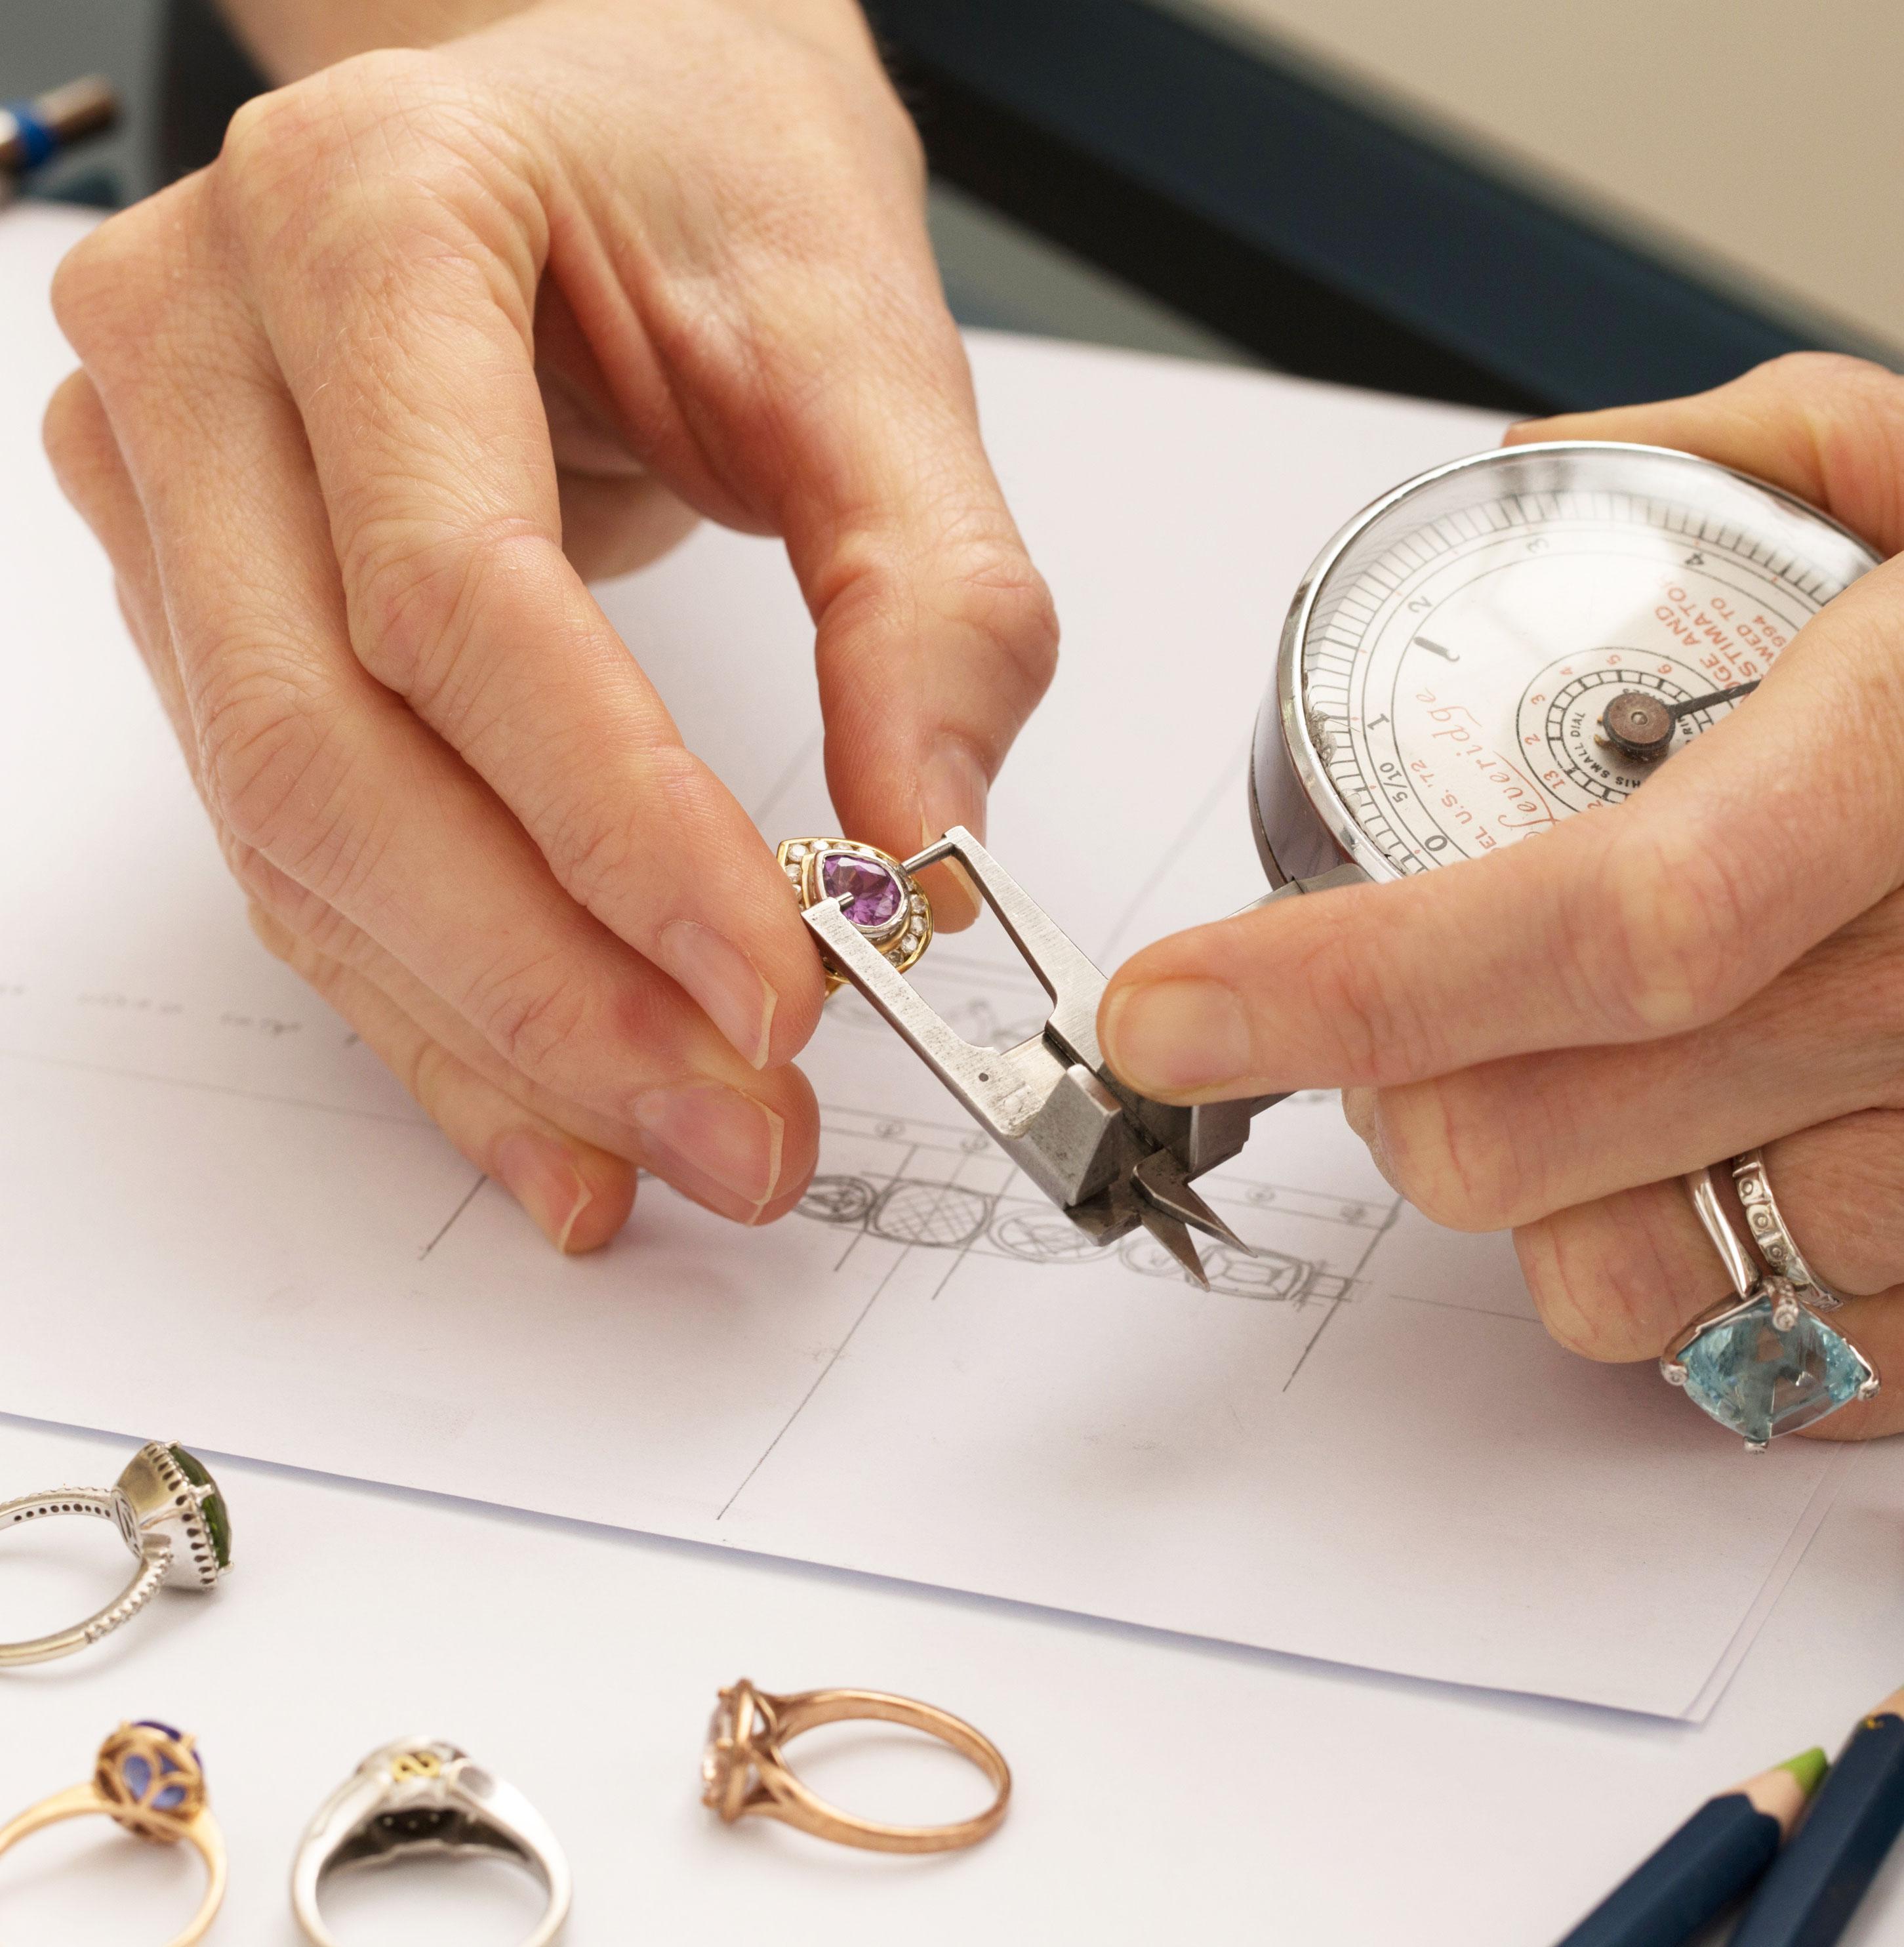 Jewellery Remodelling. Jewellery Design. David Benn Fine Jewellery, Sydney, Australia.